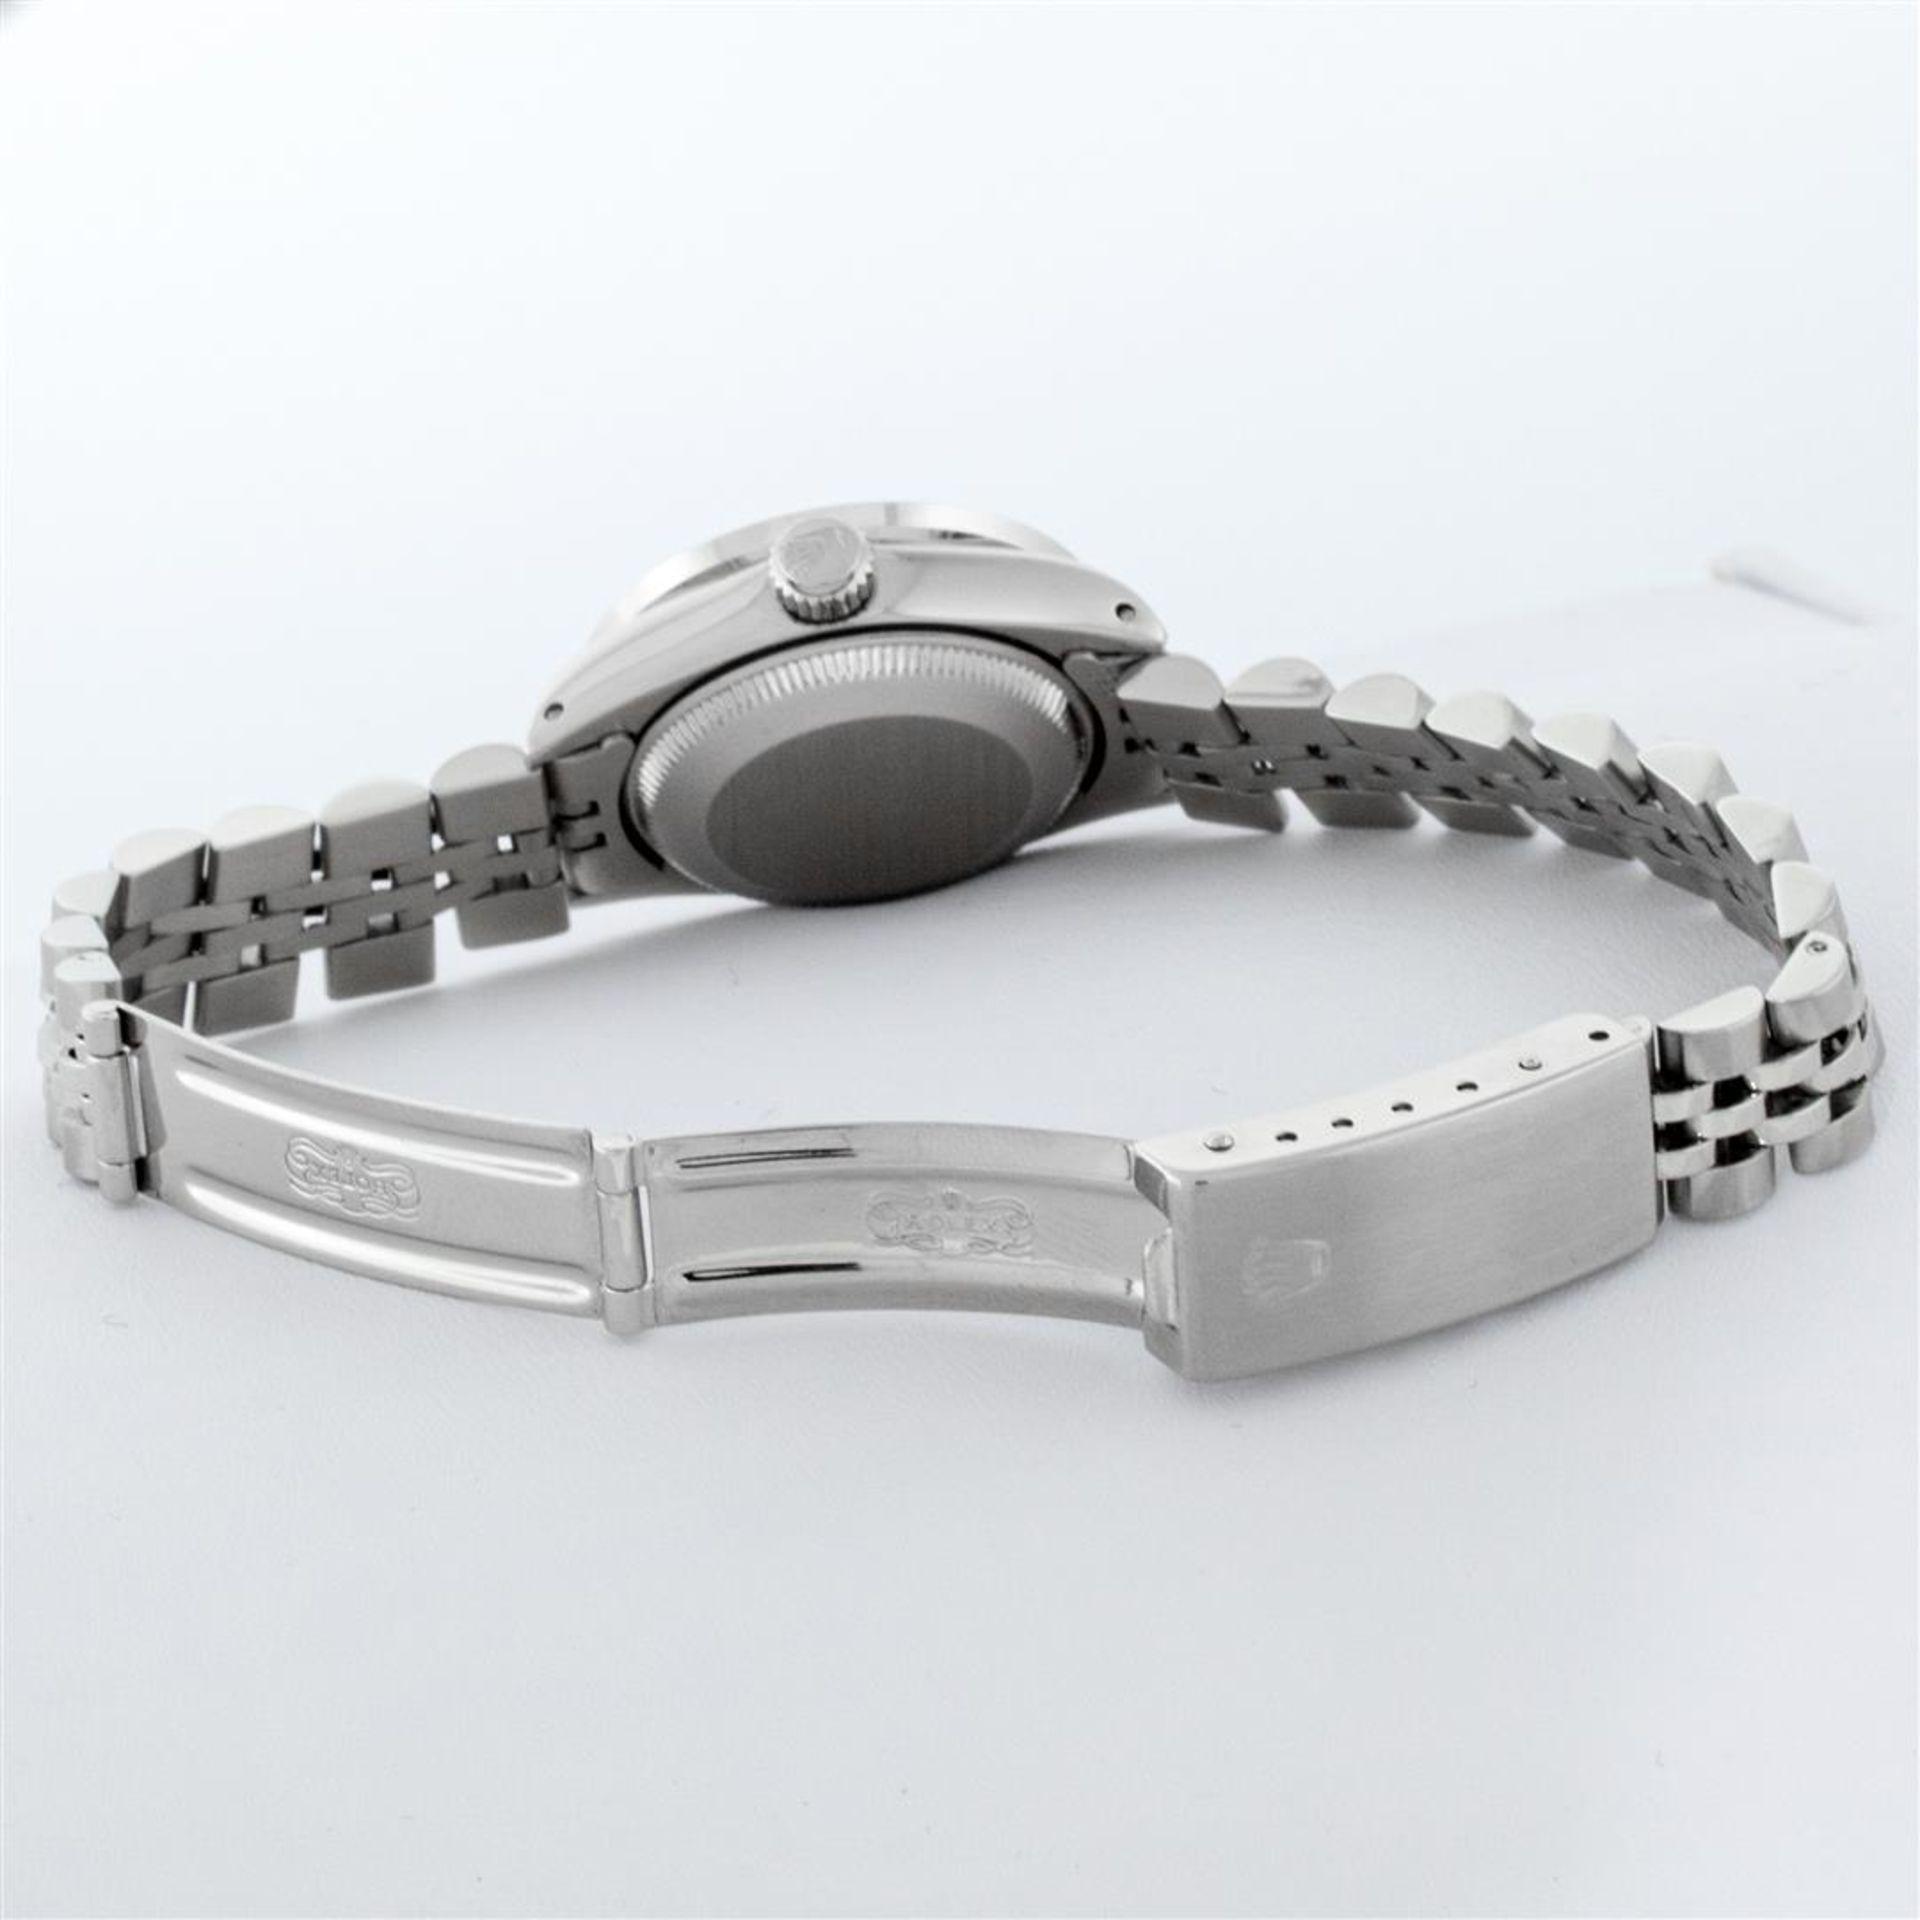 Rolex Ladies Stainless Steel Pink MOP Pyramid Diamond Datejust Wristwatch 26MM - Image 5 of 9